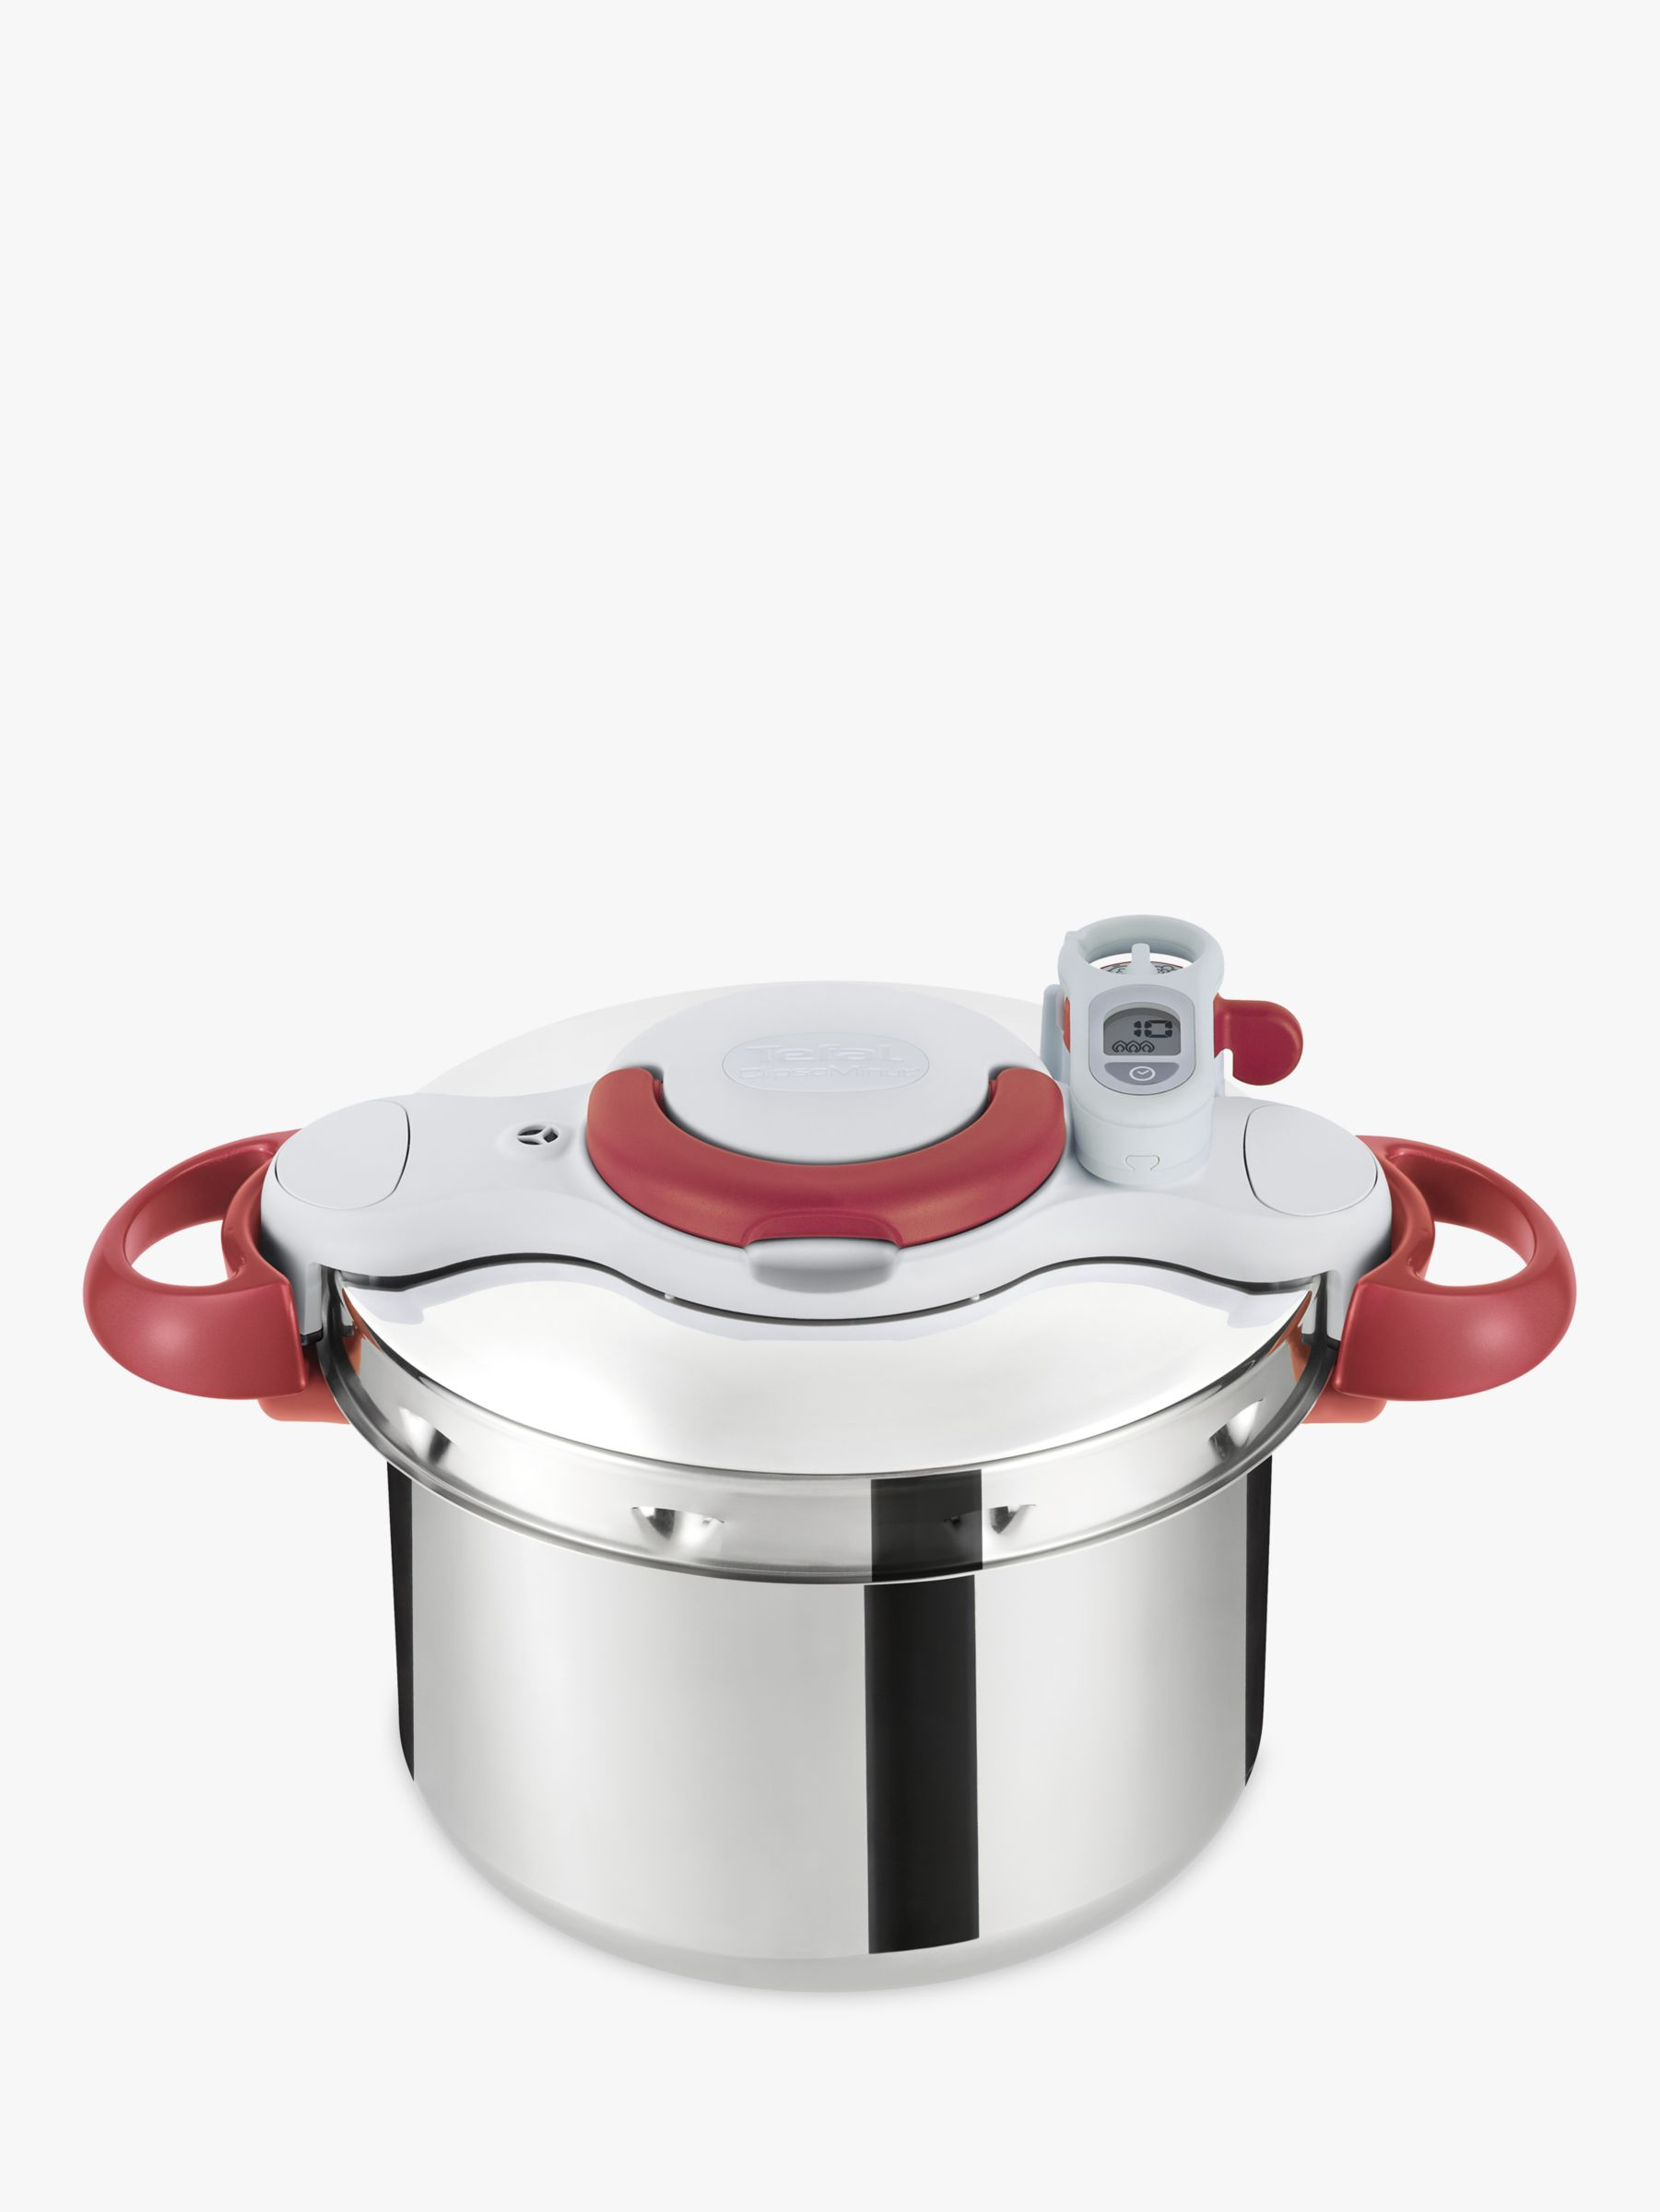 Tefal Tefal Clipso Minut' Perfect Pressure Cooker, 6L